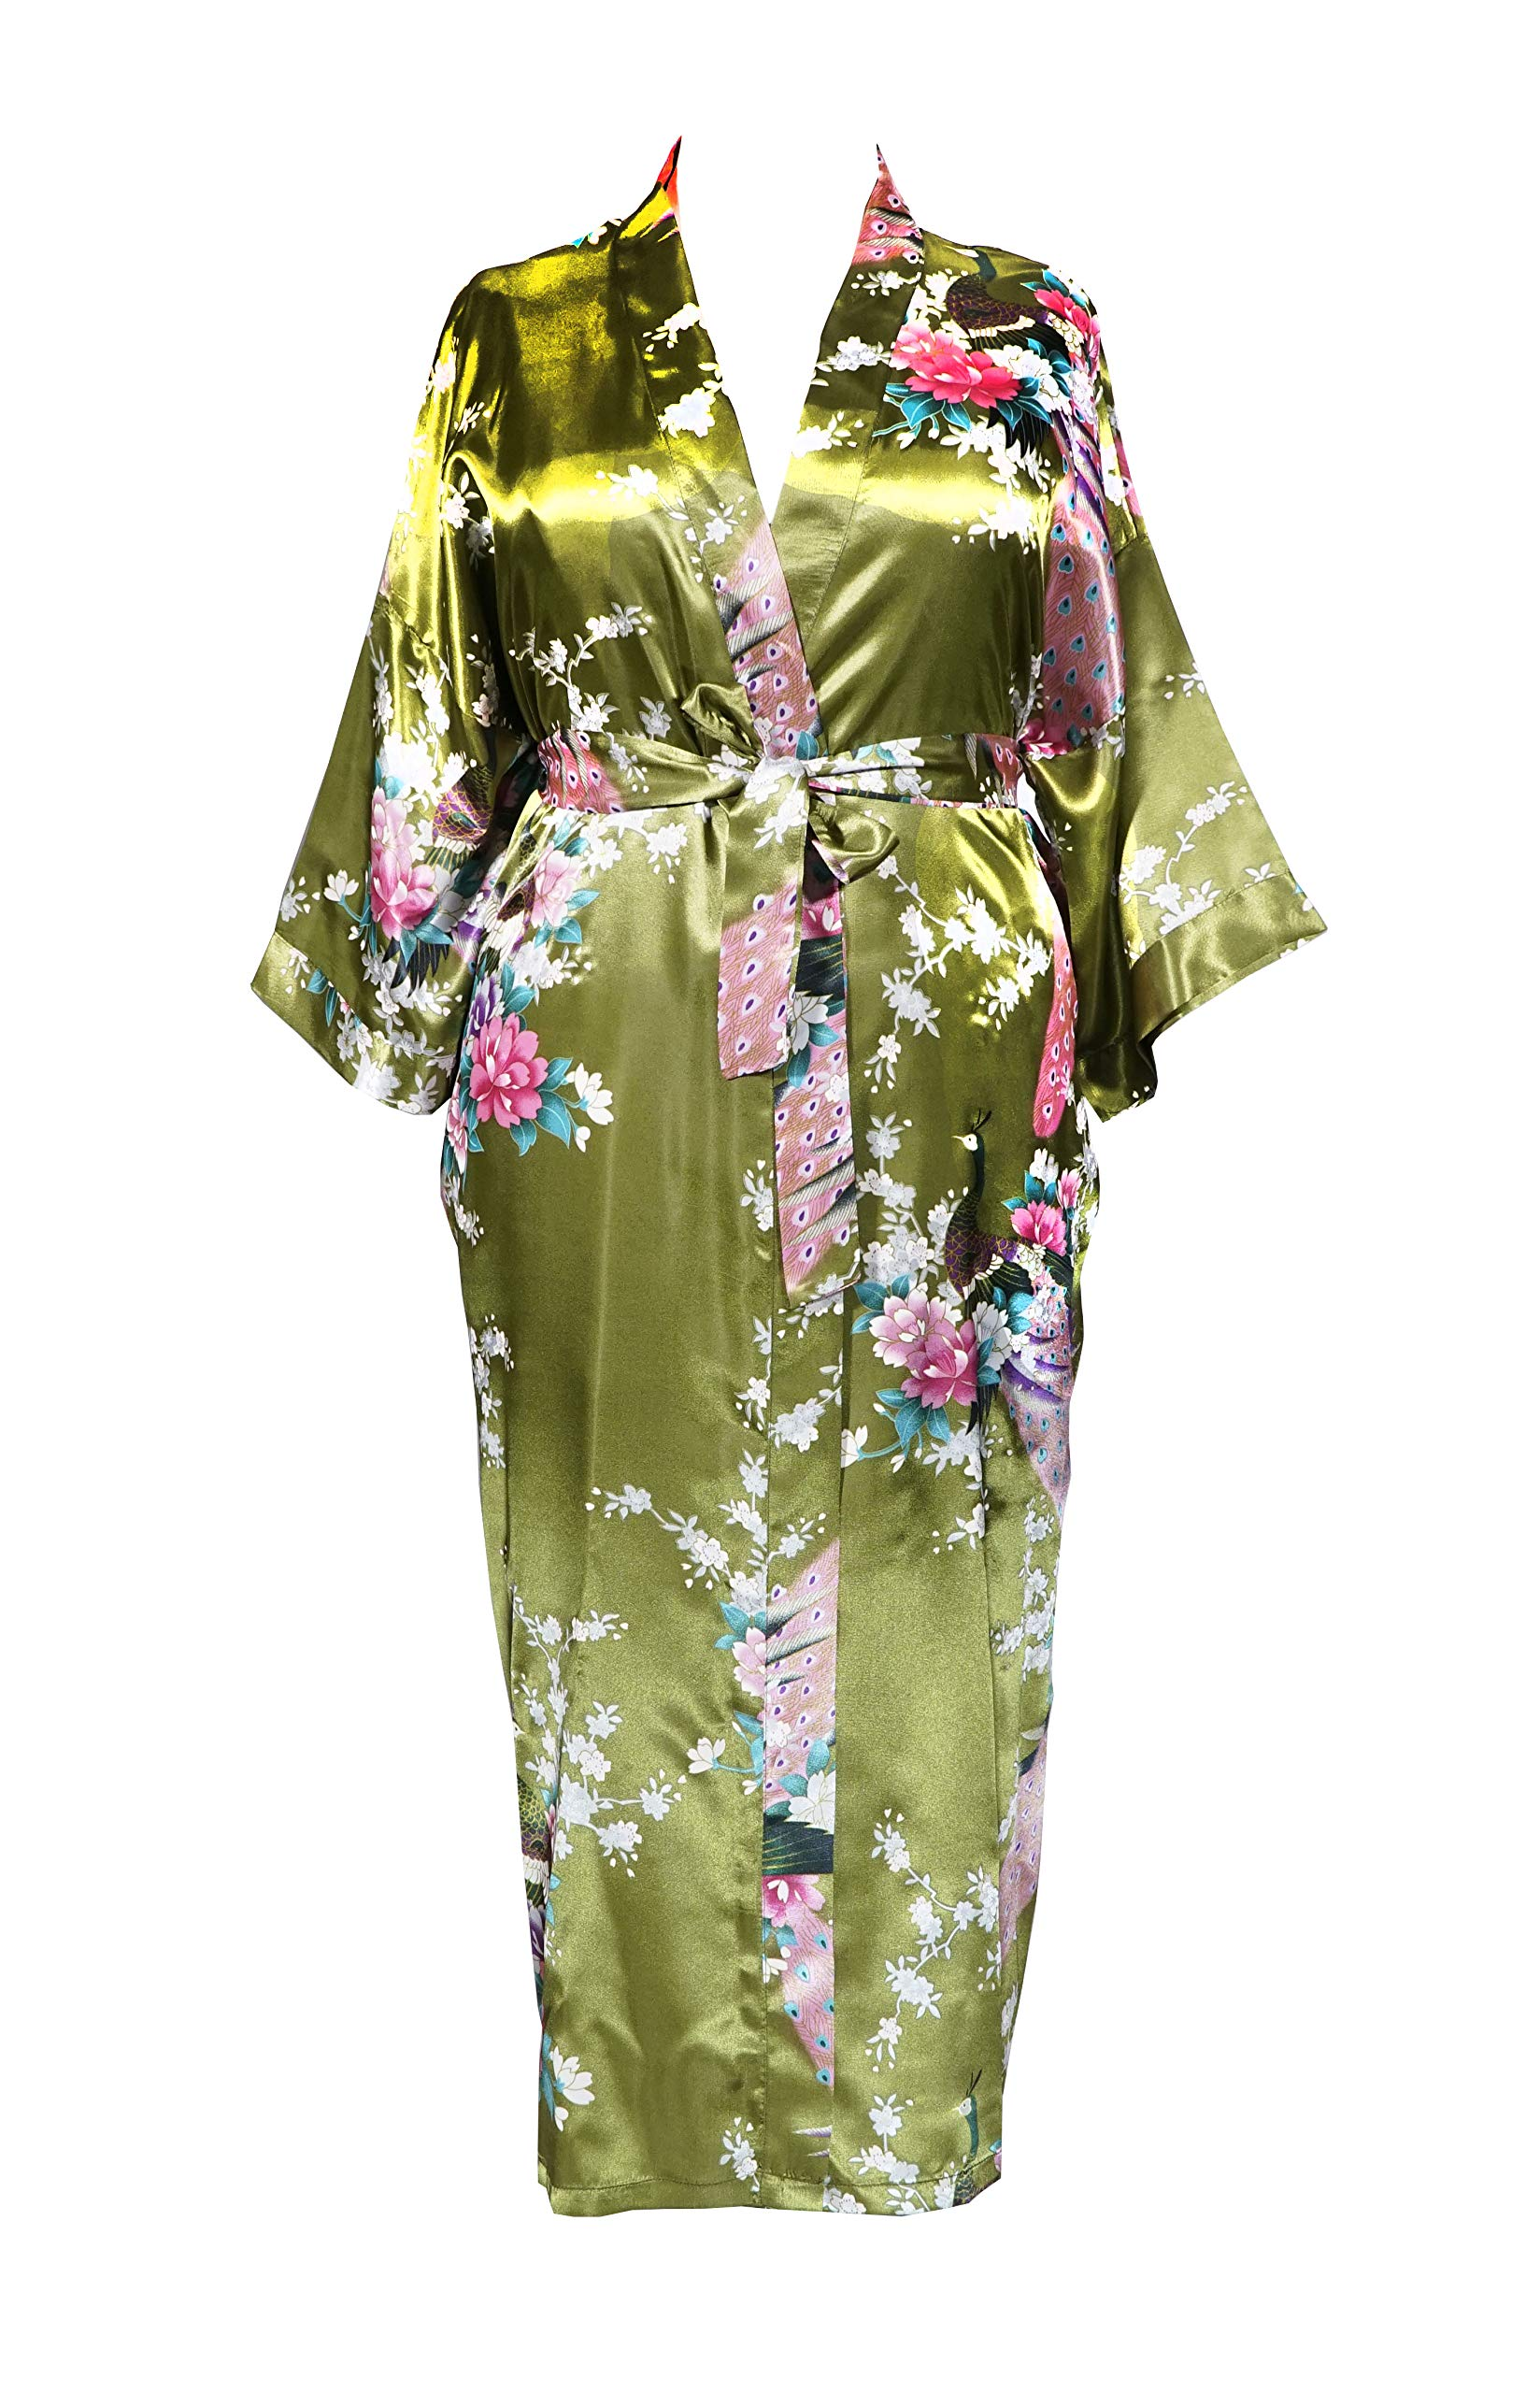 Applesauce 838 - Plus Size Women's Kimono Long Robe - Peacock Blossom (US One-Size fits Most 1X 2X 3X) (Peridot Green)